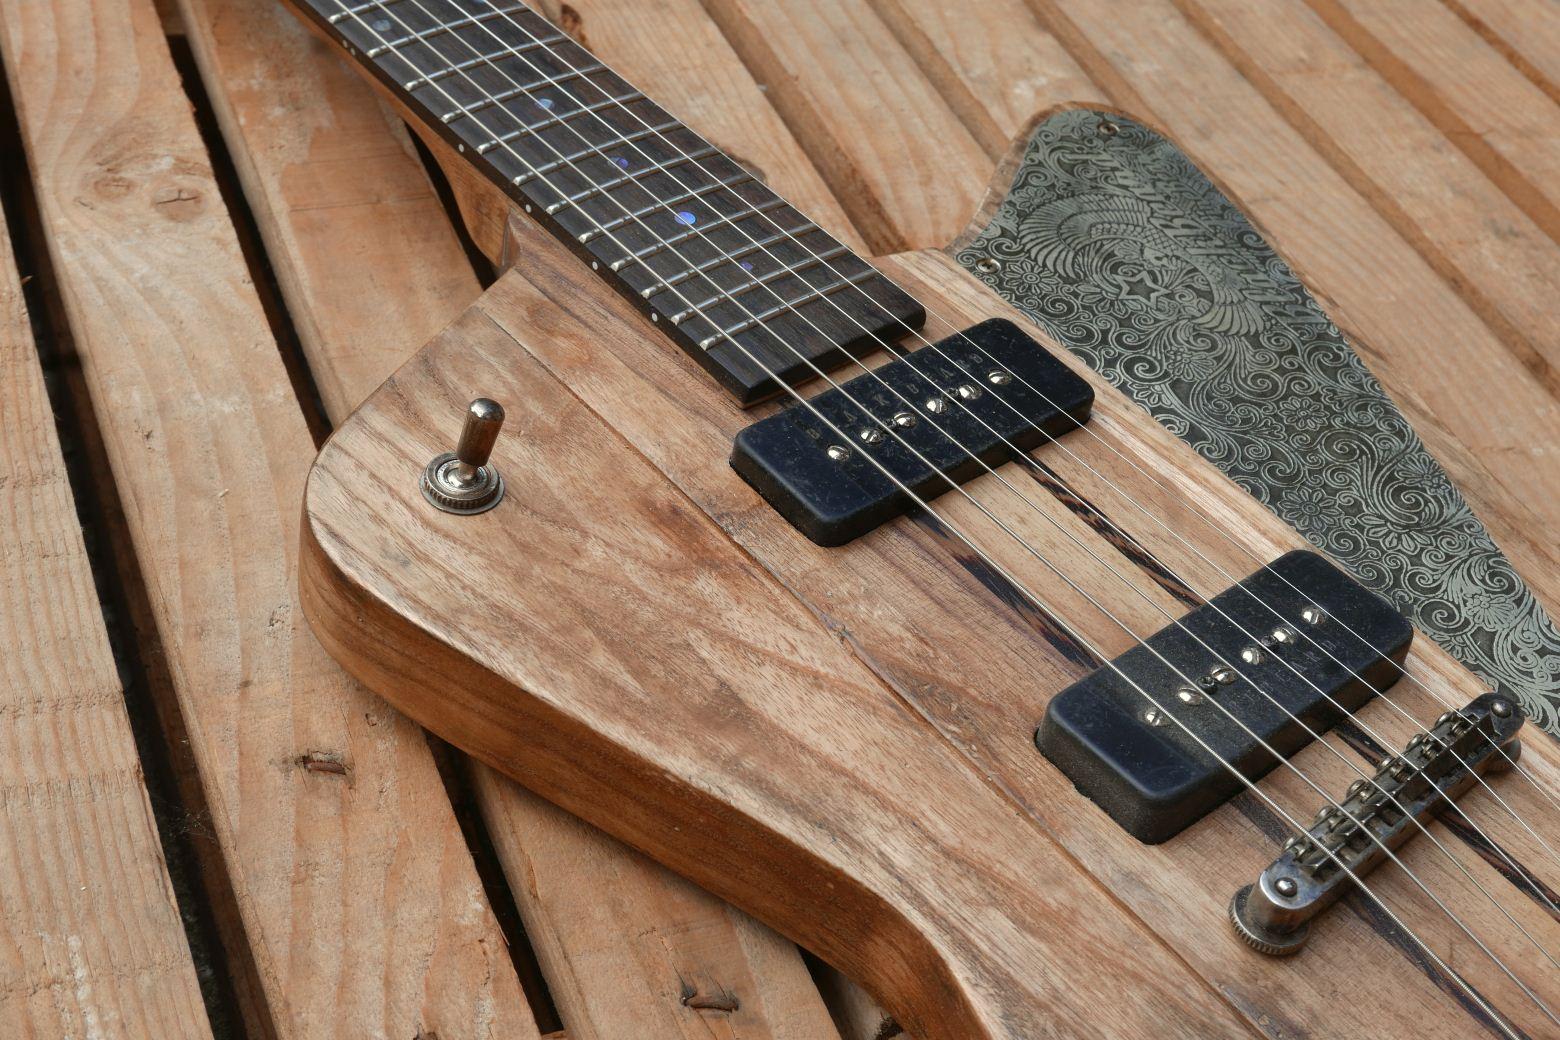 body guitar p90 pichups